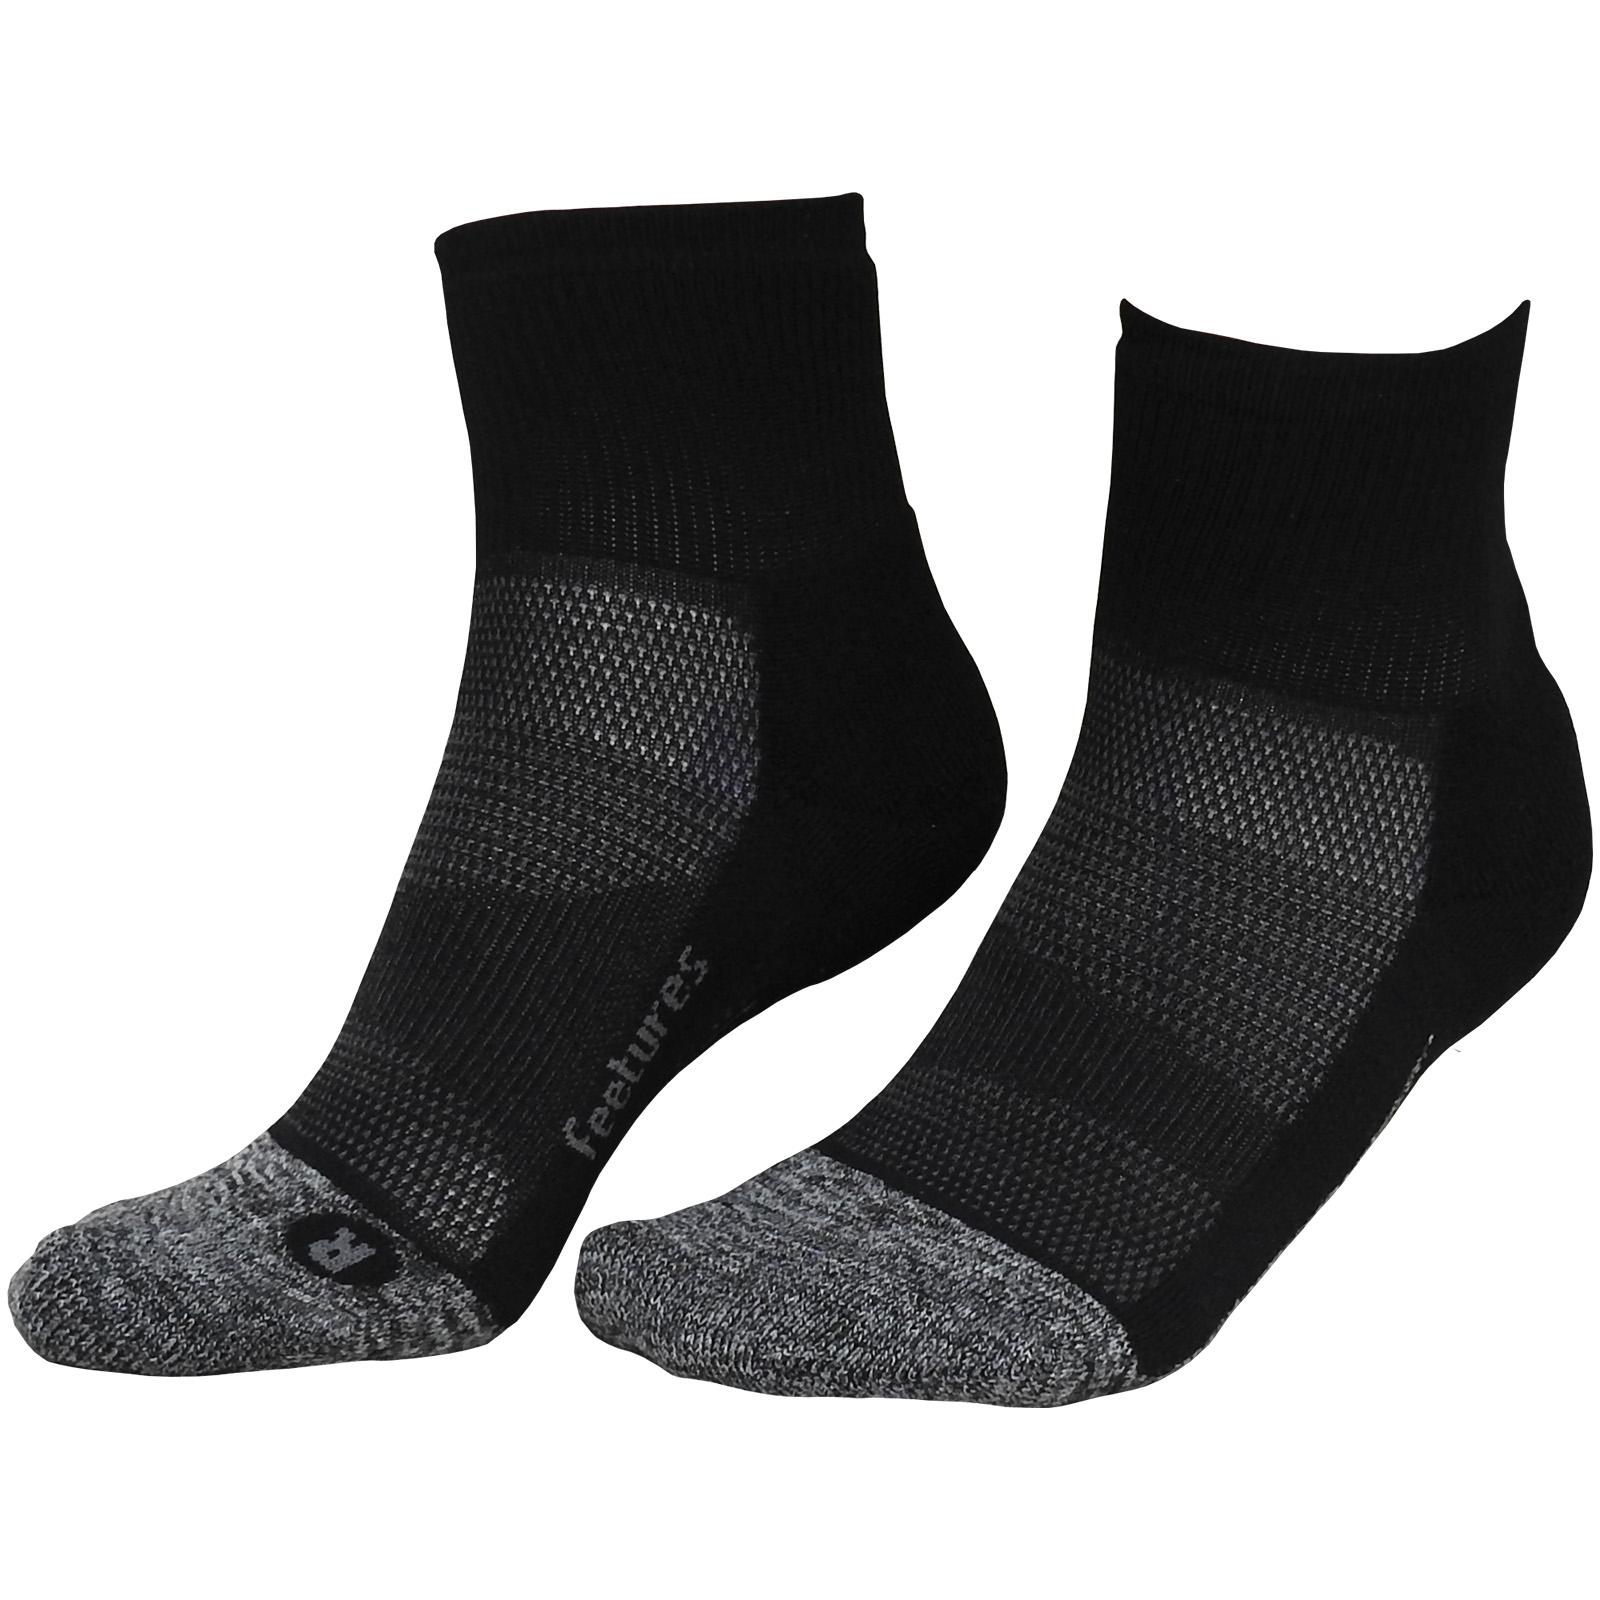 Feetures Elite Quarter Length Ultimate Sports Running Gym Workout Socks Grey